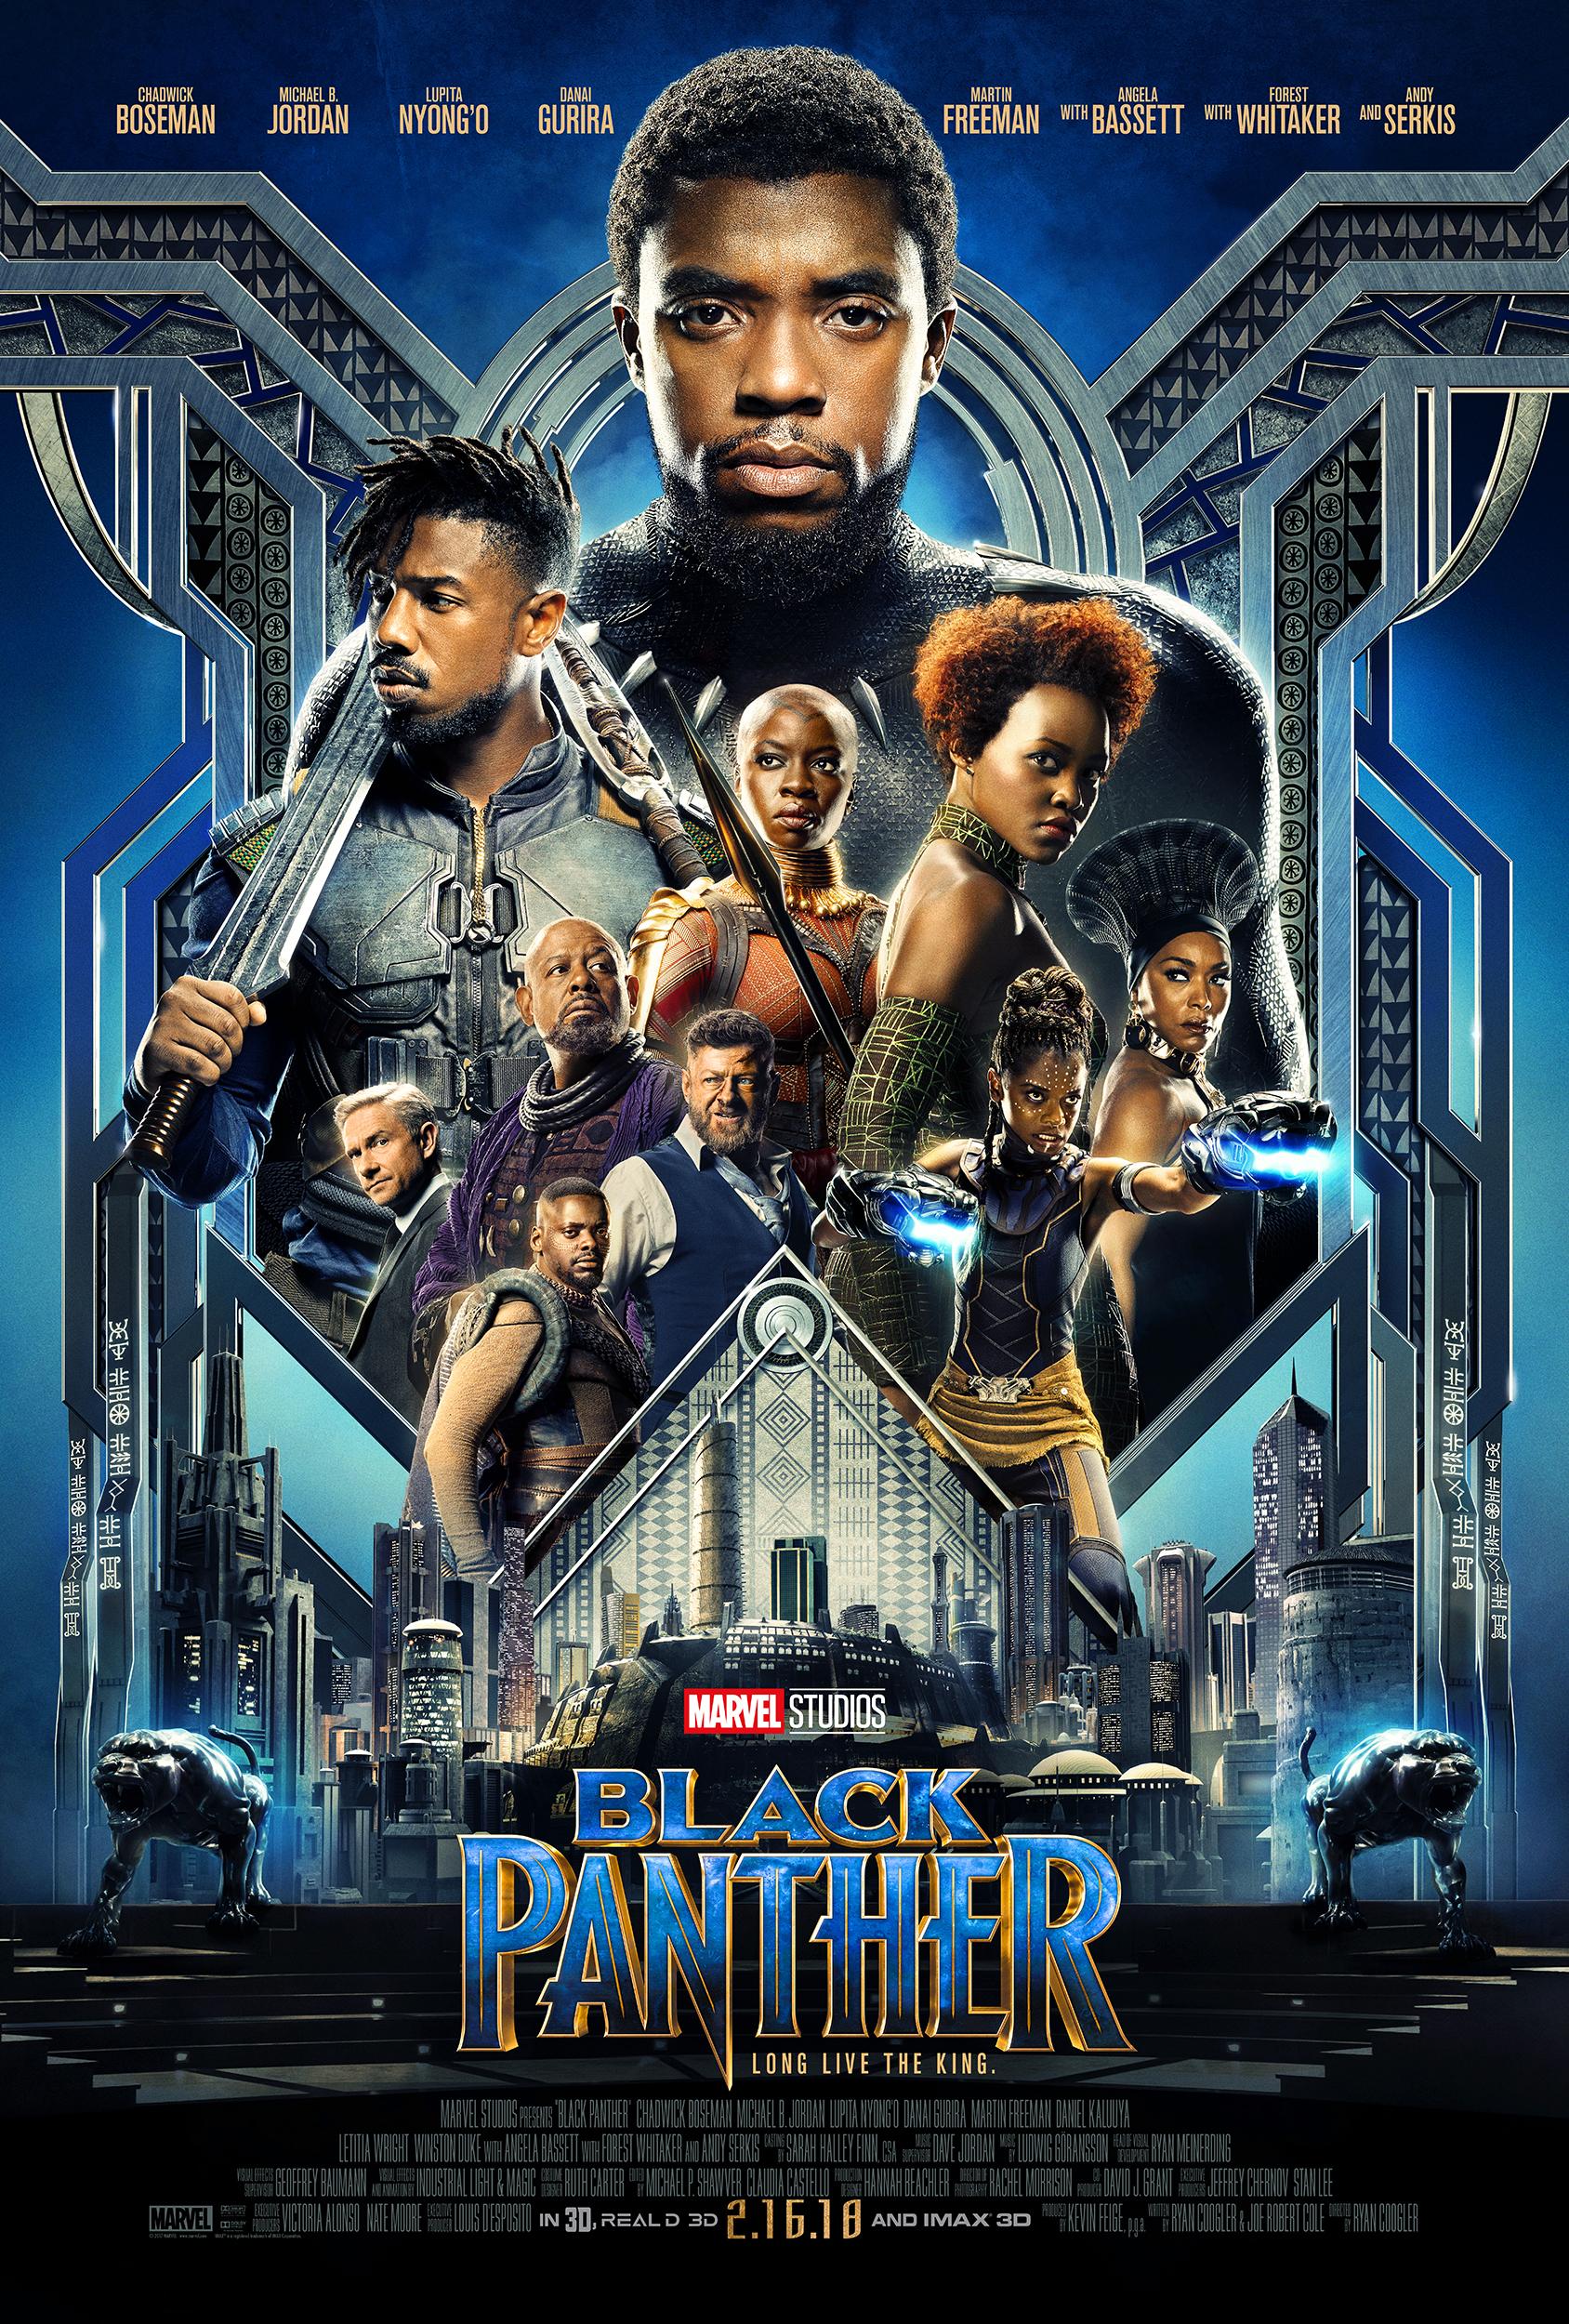 Black_Panther_Poster_October_2017